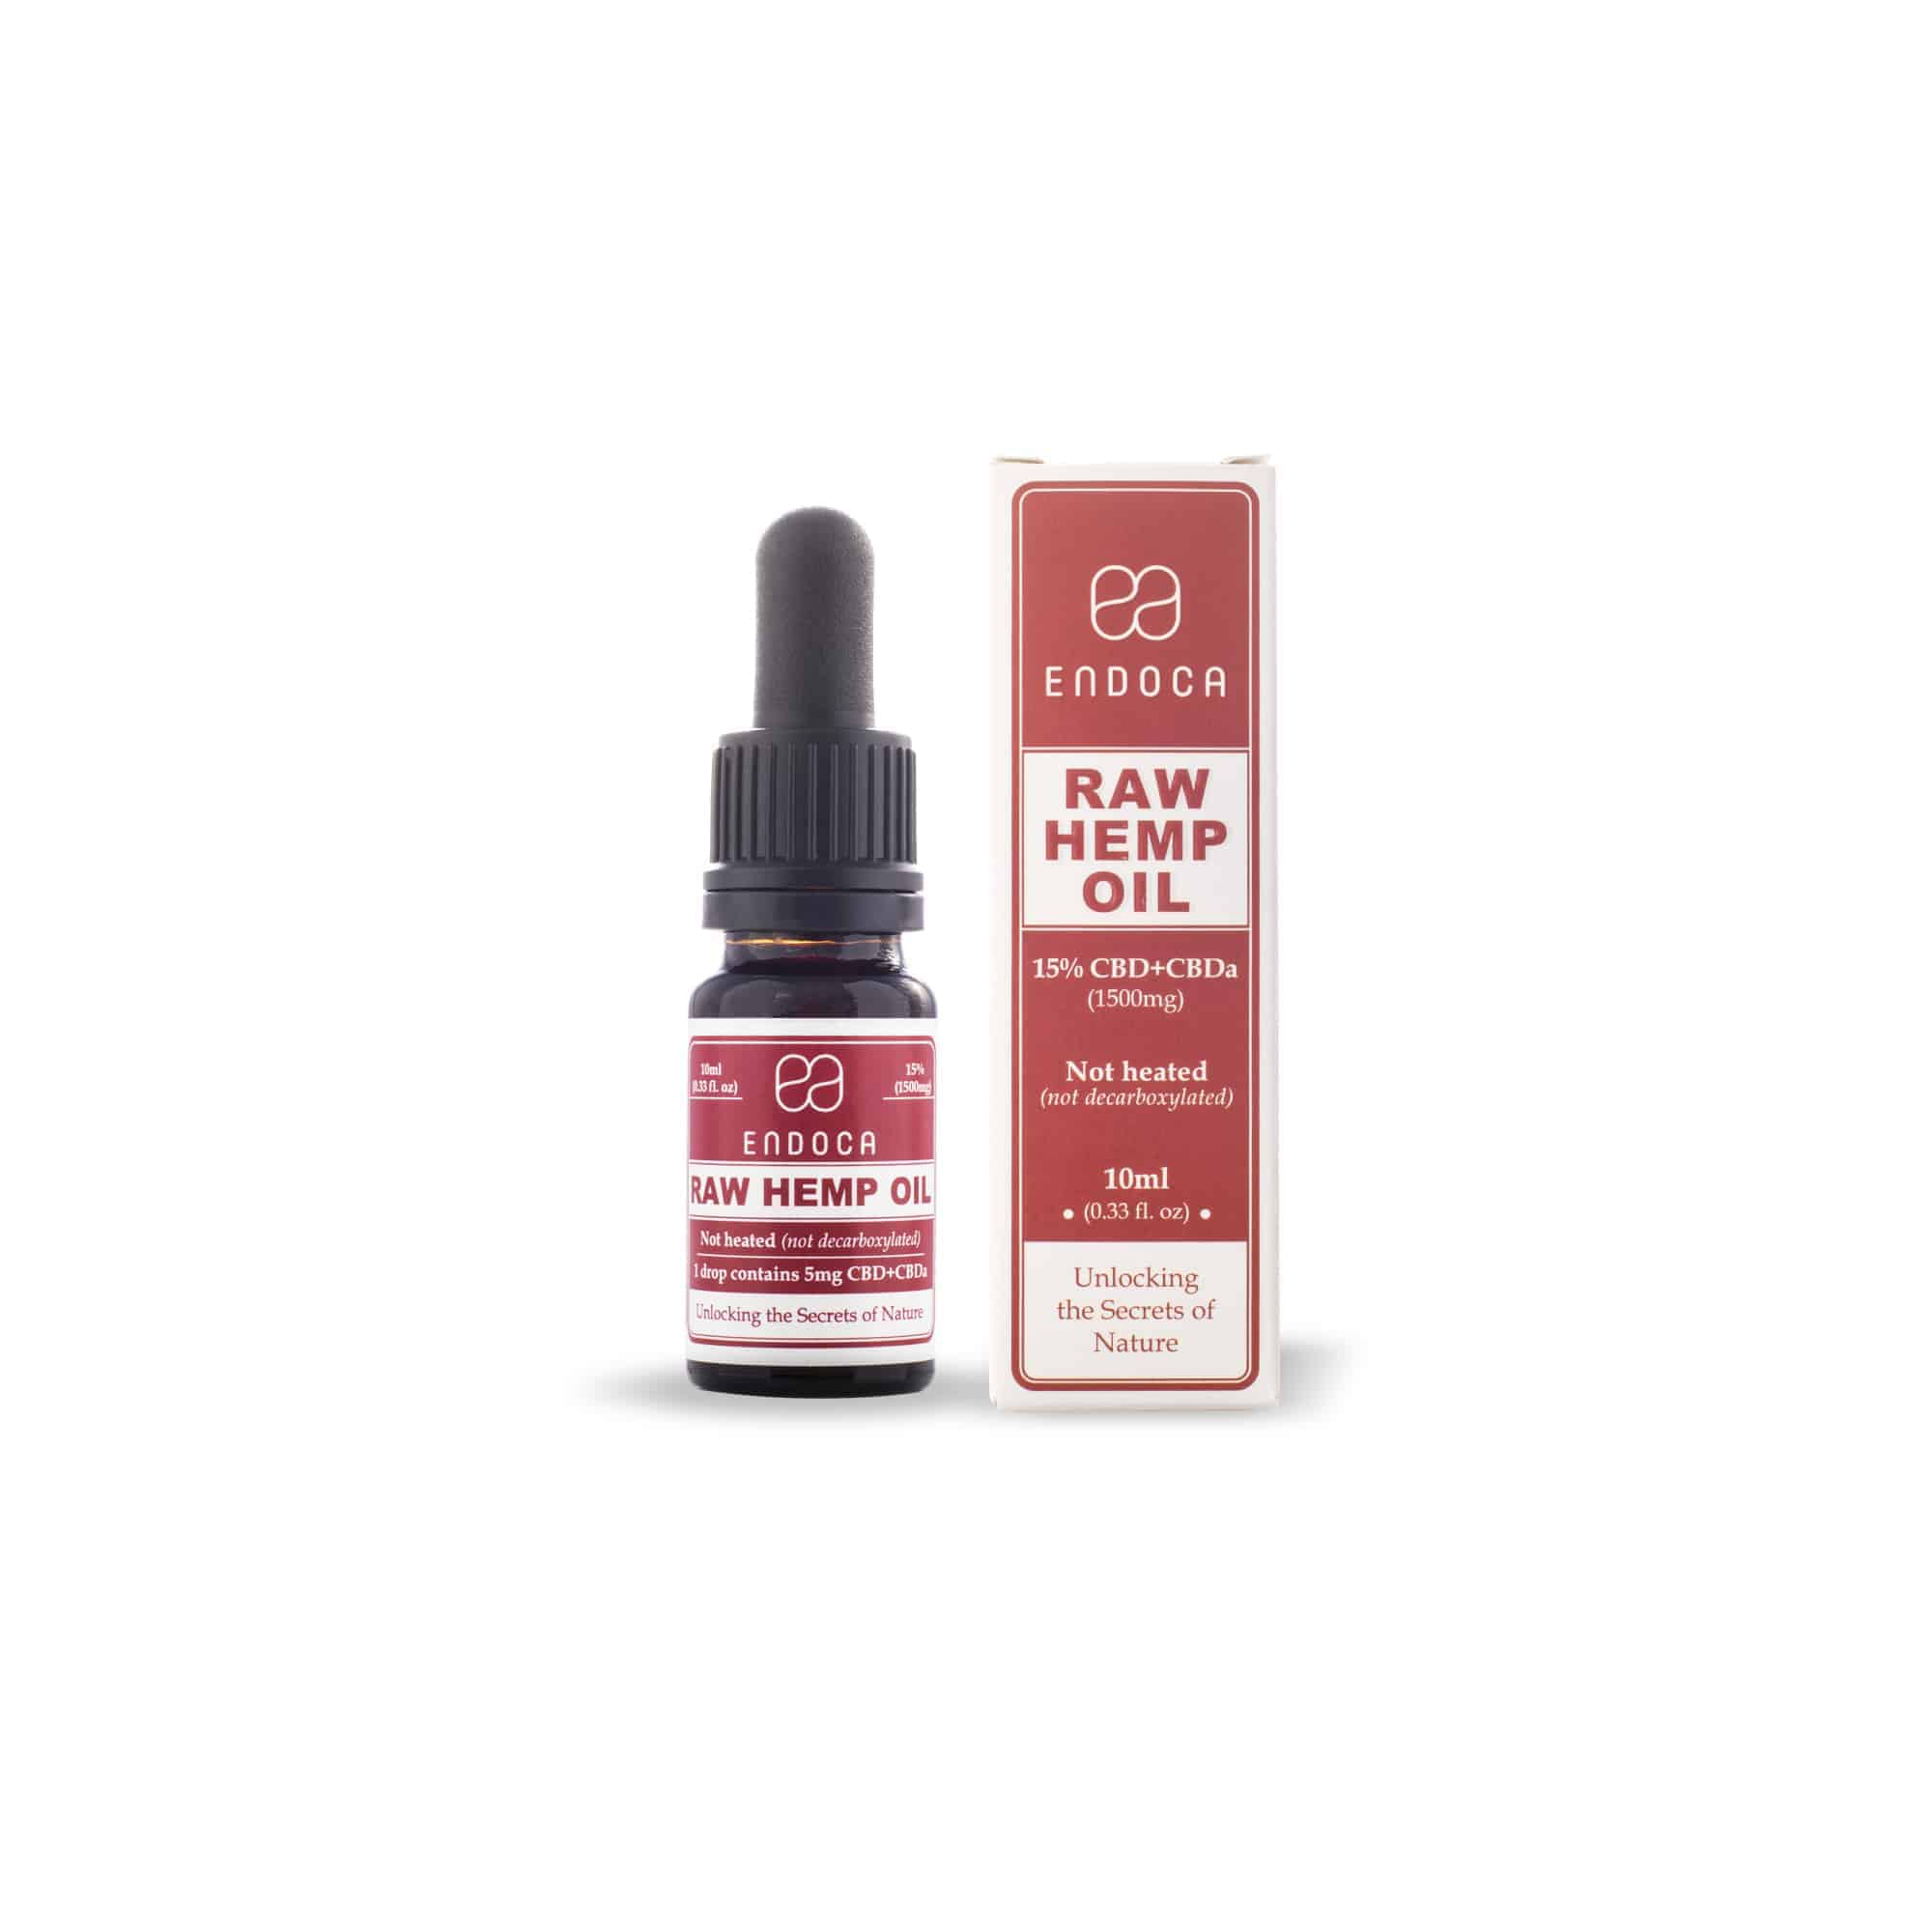 Endoca RAW Hemp Oil Drops (1500mg) CBD+CBDa (15%)